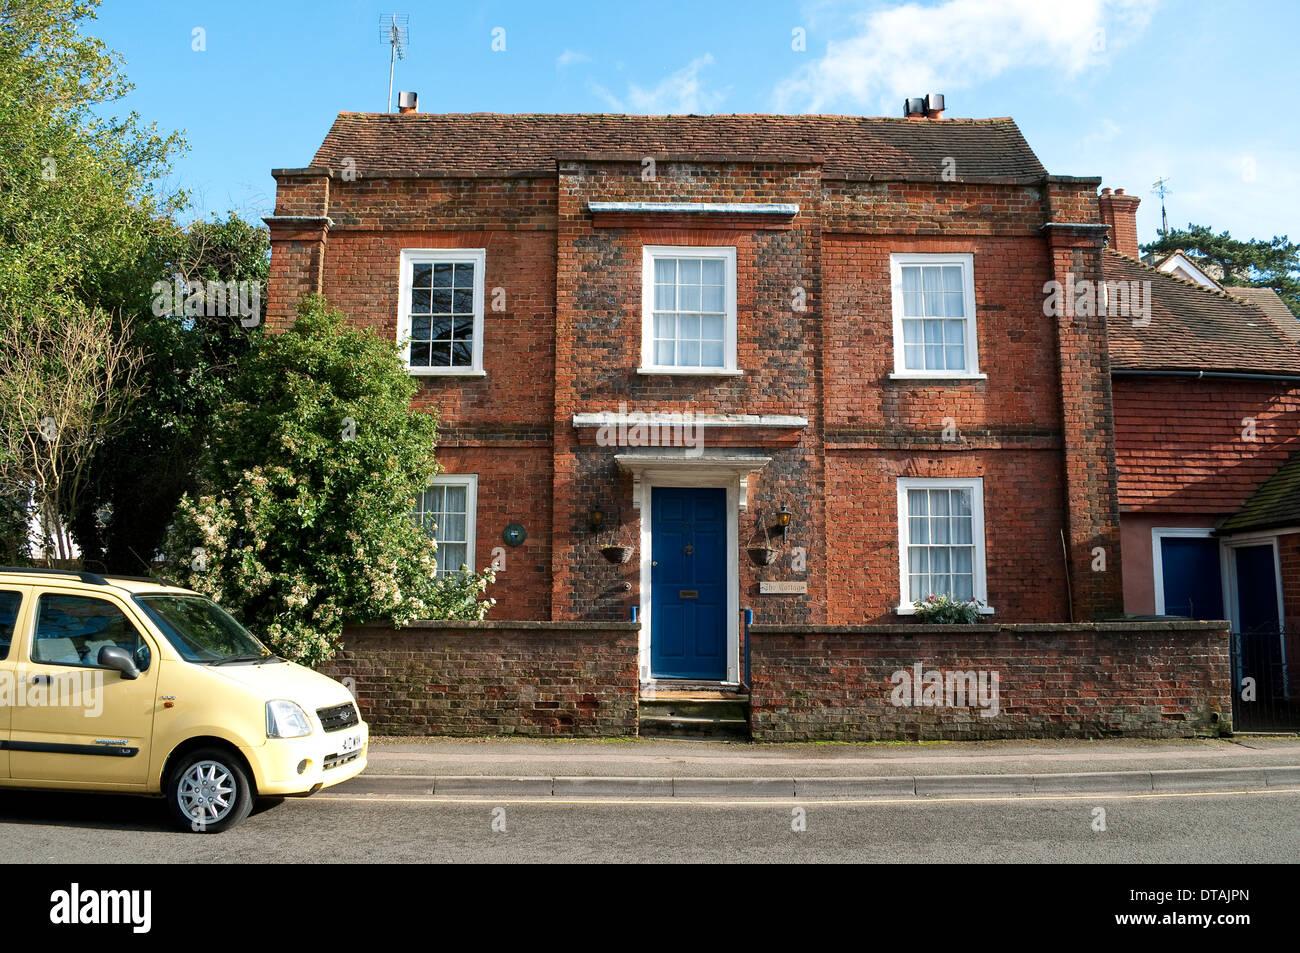 Georgian brick house, Leatherhead, Surrey, England, UK Stock Photo